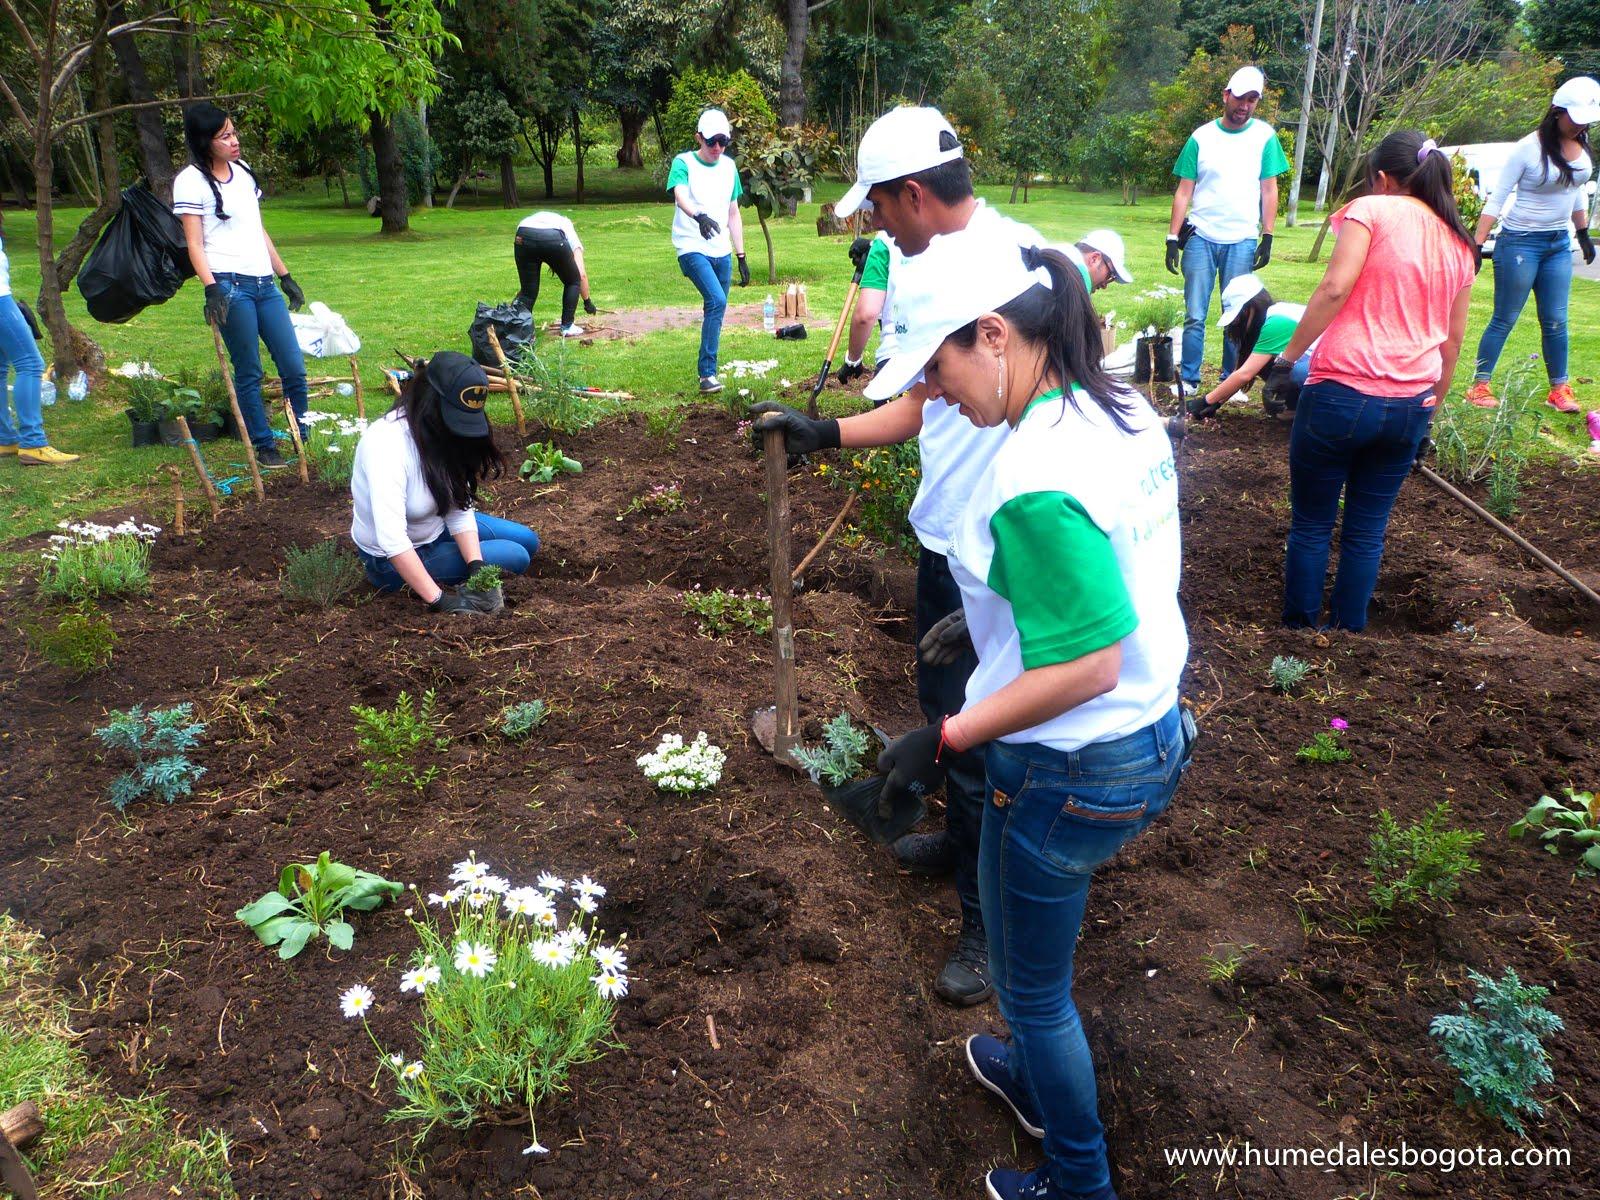 Jardinesbiodiversos humedalesbogota  121 de 138